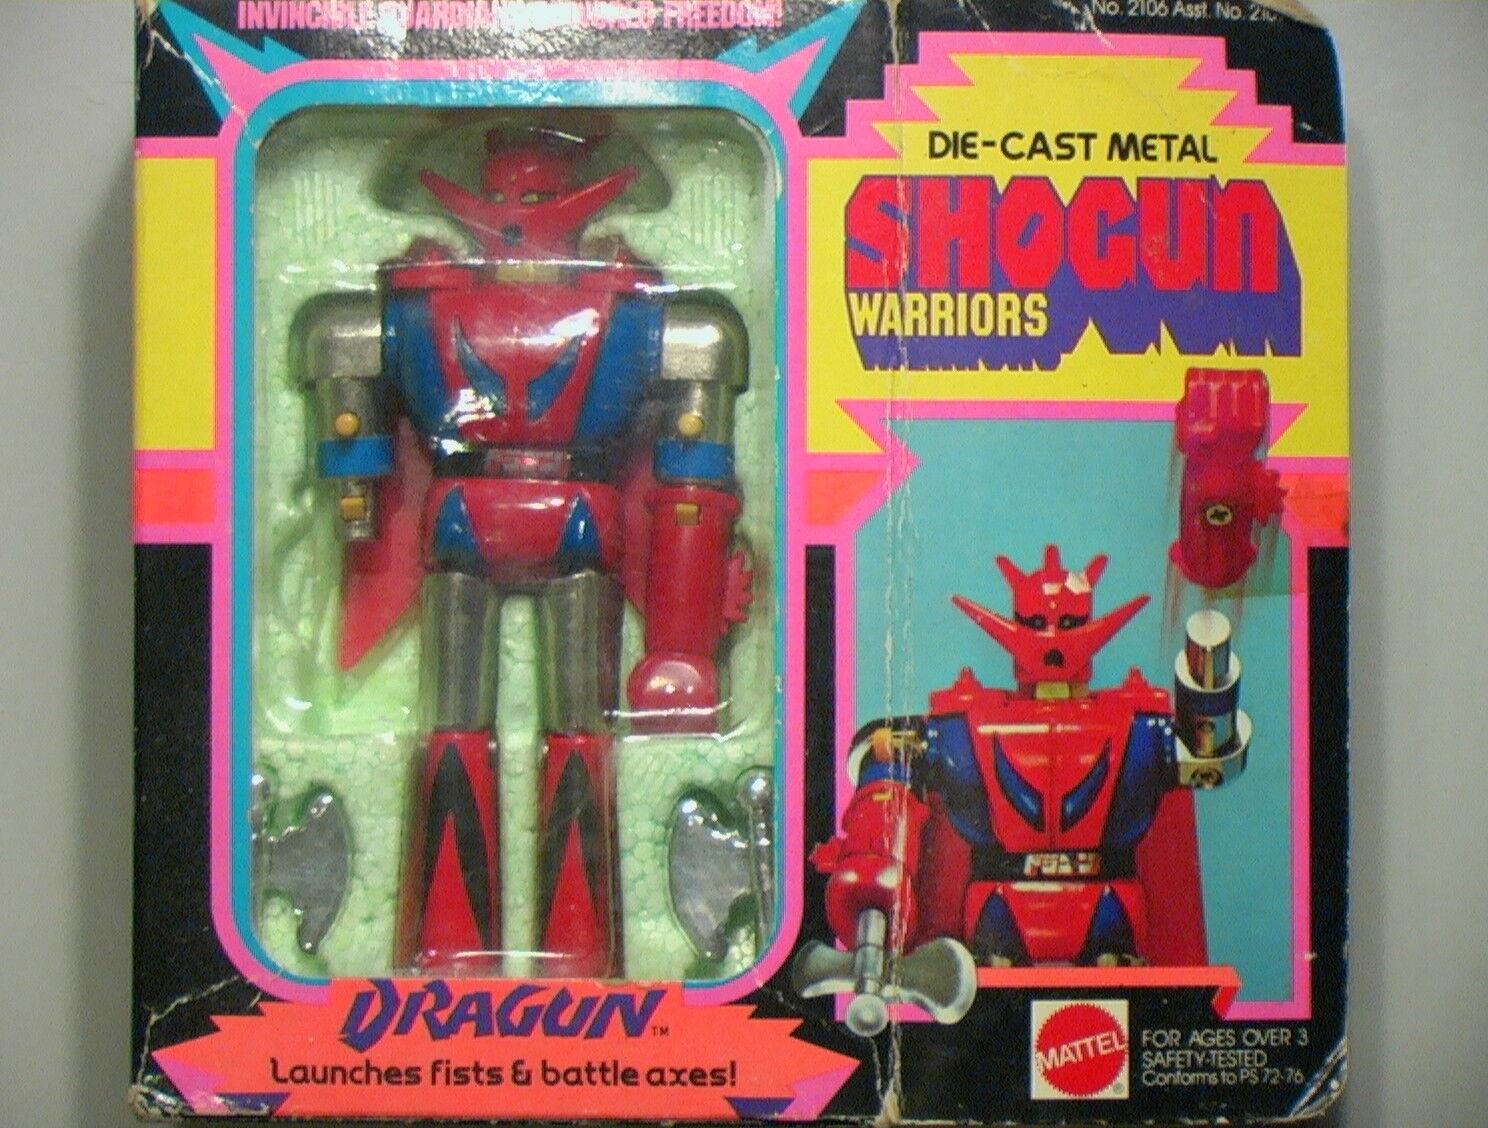 Shogun Warriors VINTAGE 1977 Dragun 5  Incomplete w Box Instrc C-6 Mattel Bandai